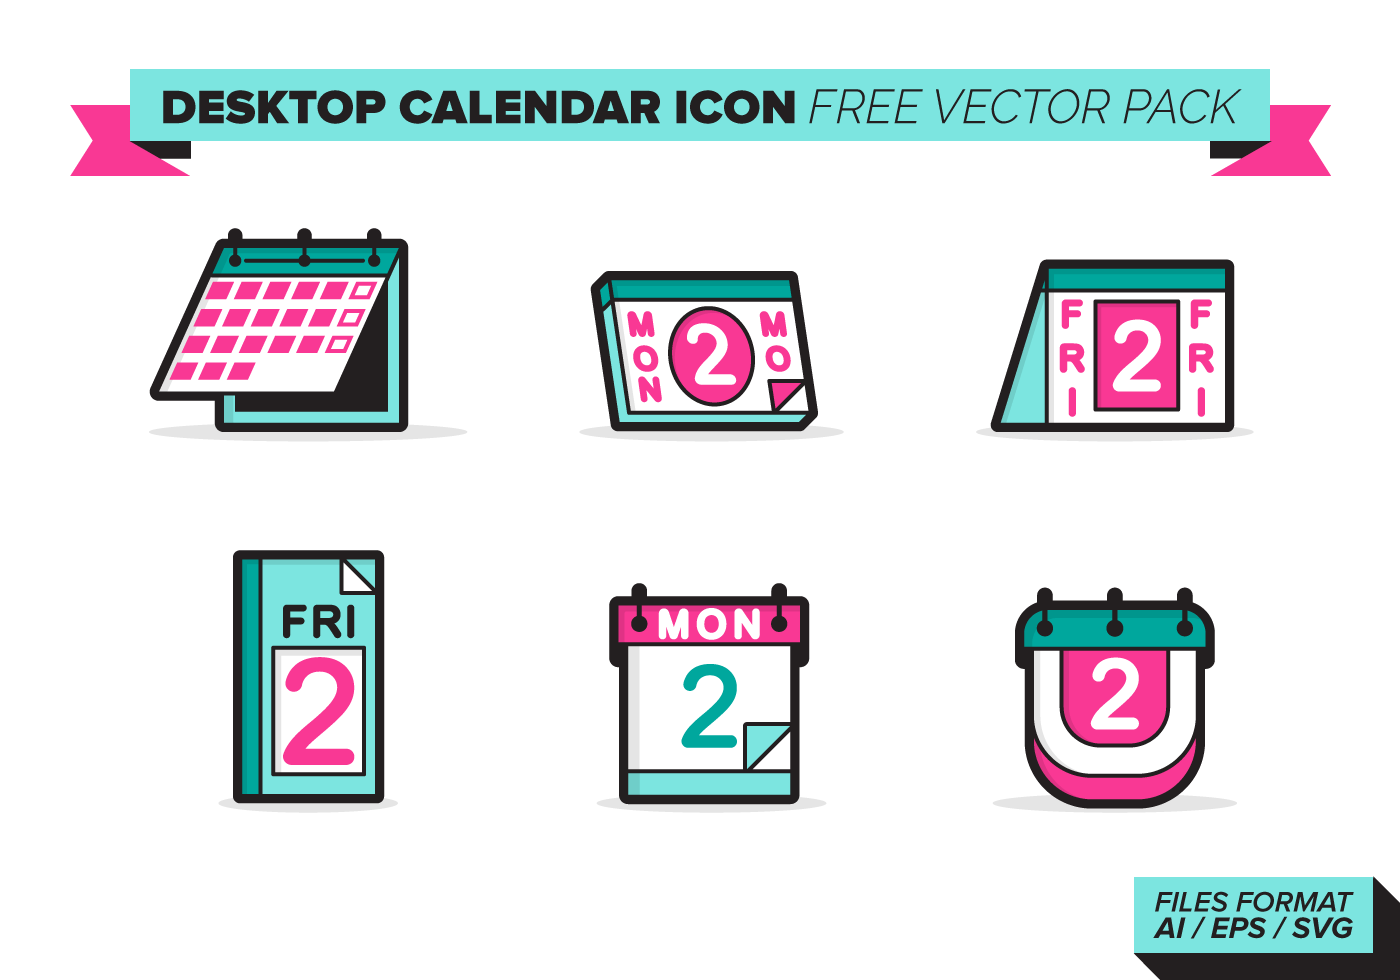 Calendar Vector Art Free : Desktop calendar icon vector pack download free